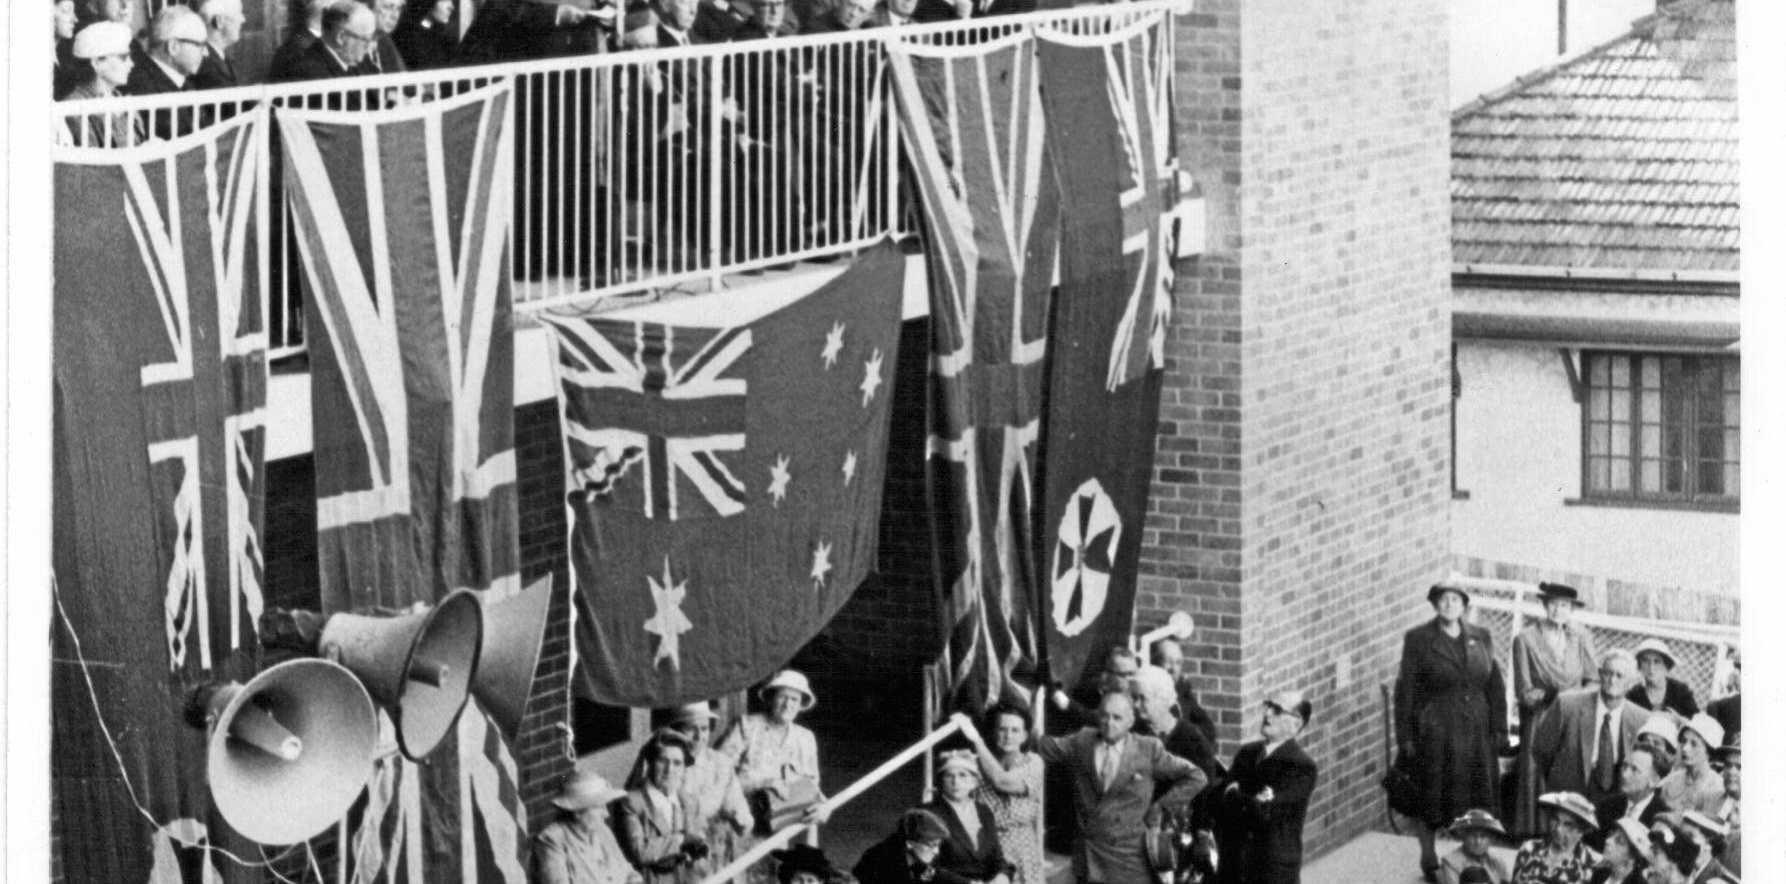 Hospital opening on 8 September 1957 by Archbishop Duhig.